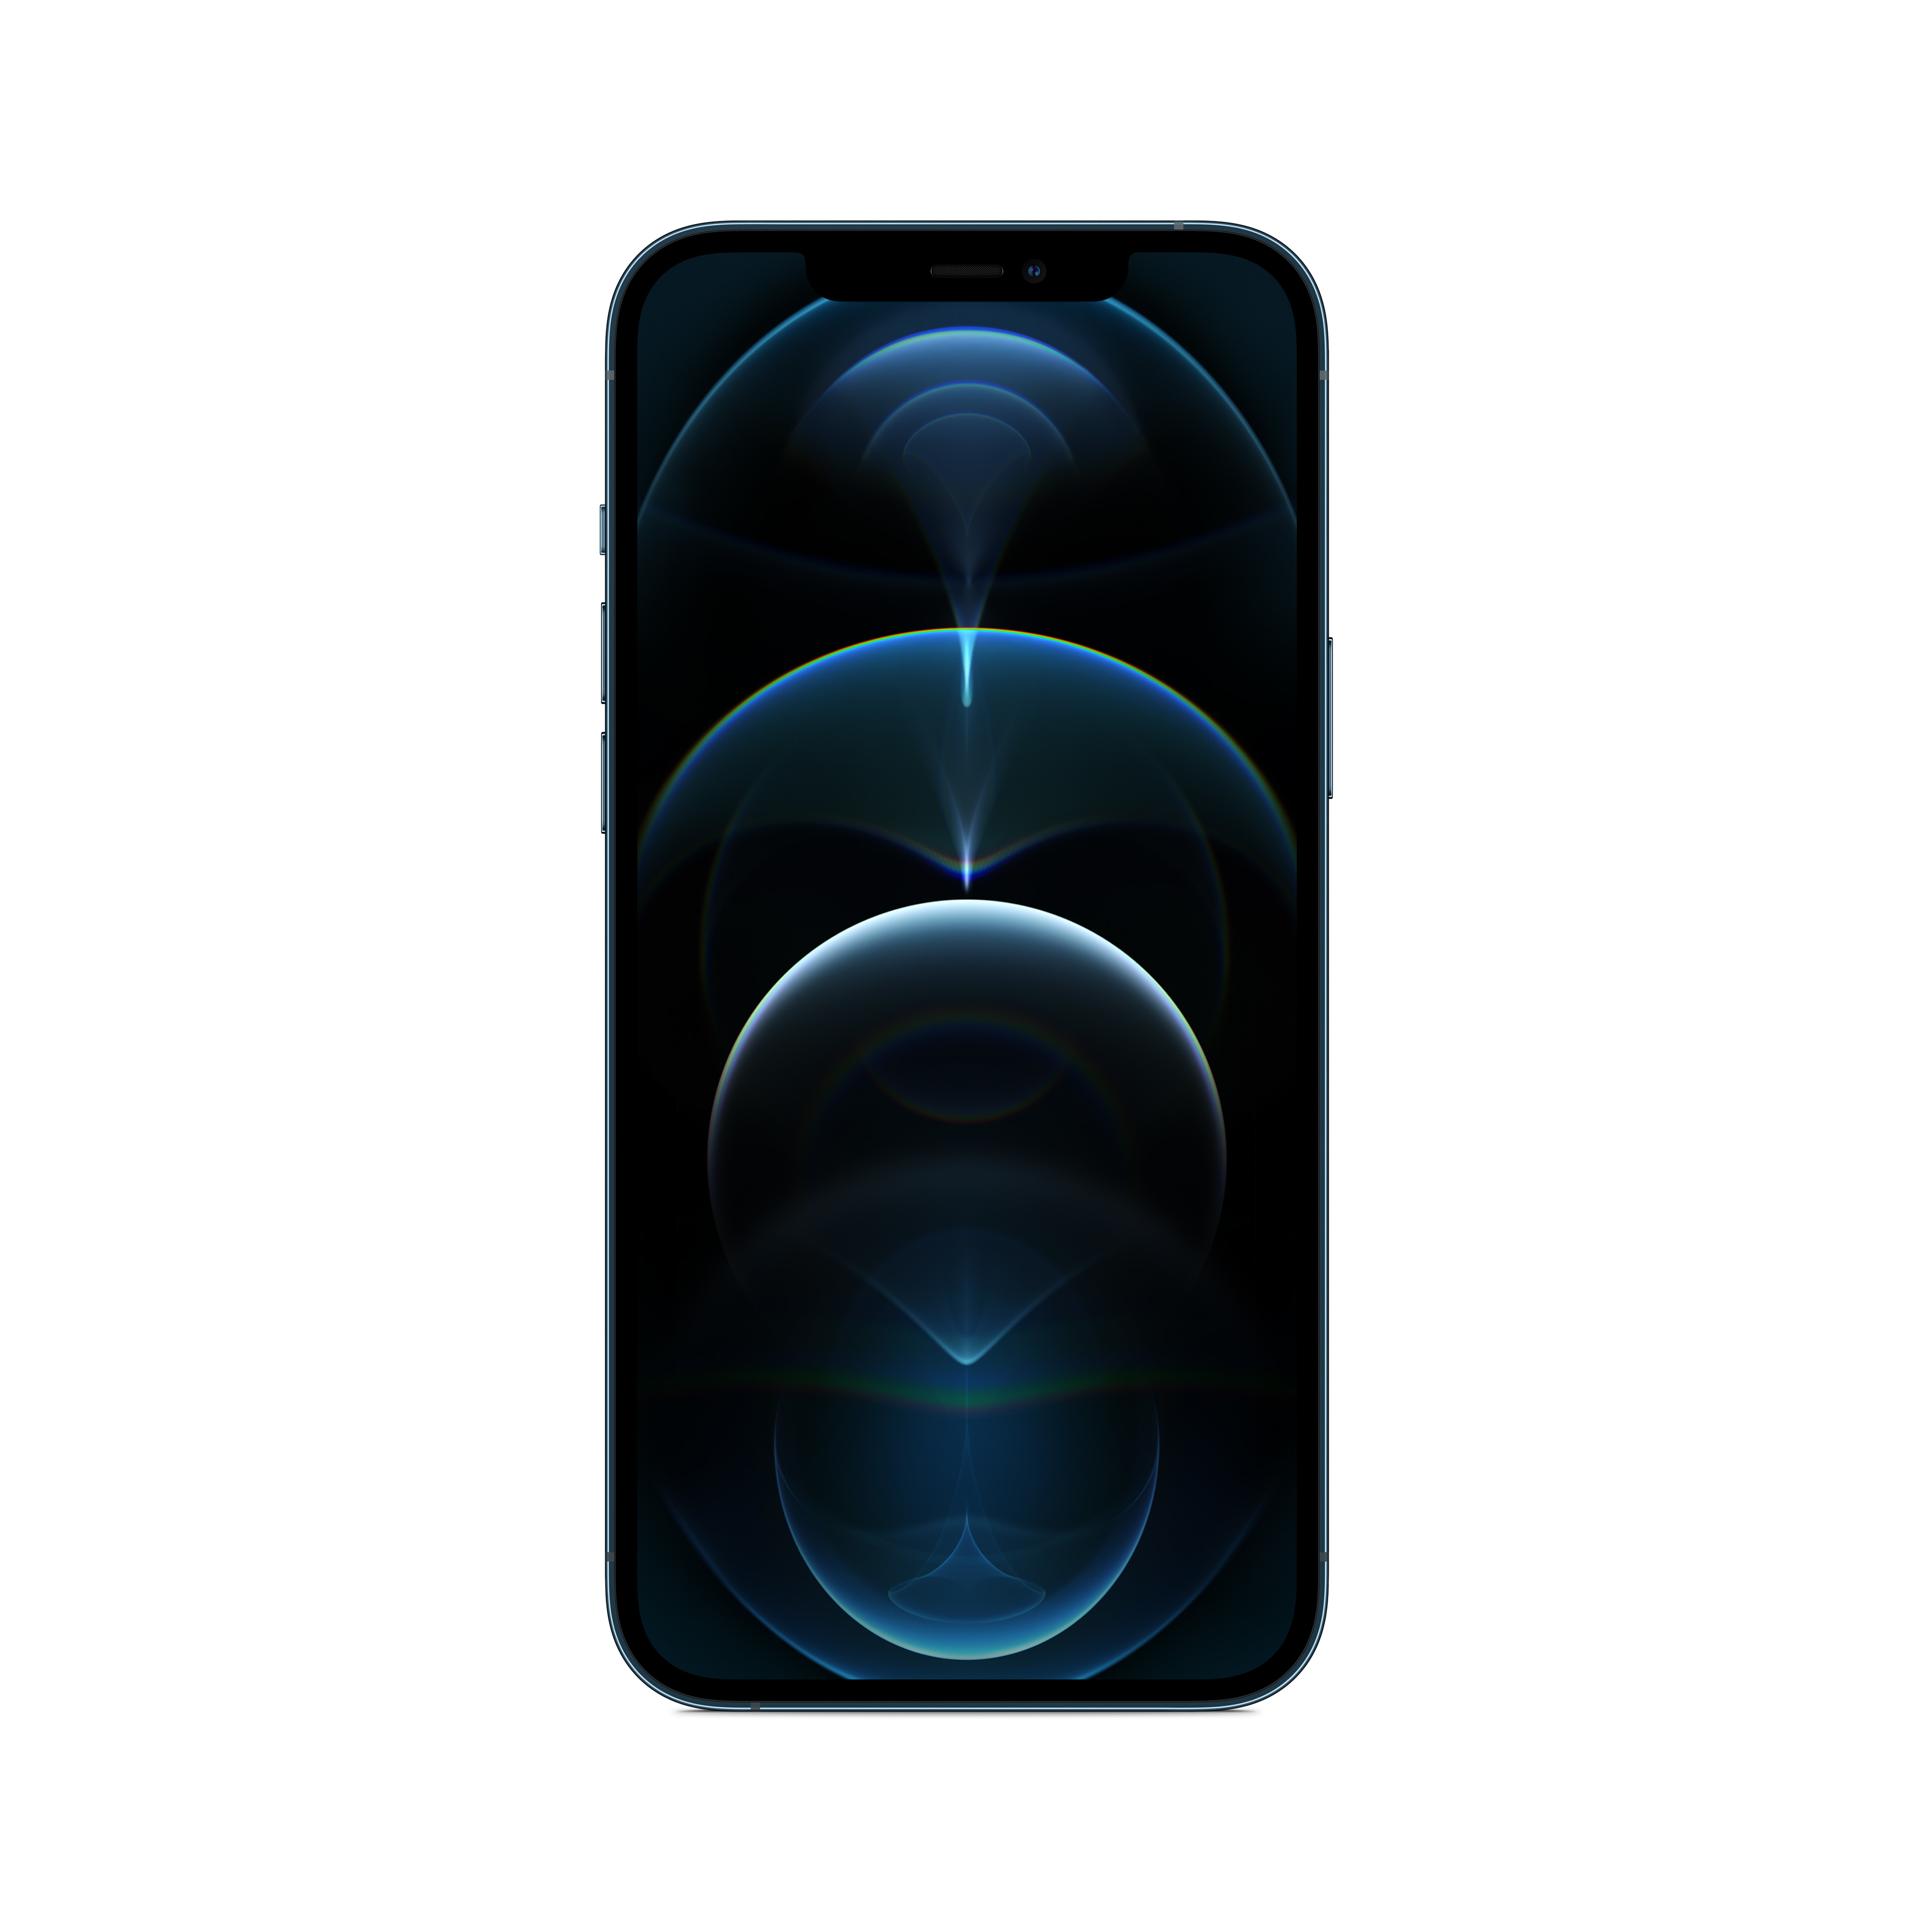 Apple - iPhone 12 Pro Max 256gb Pacific Blu